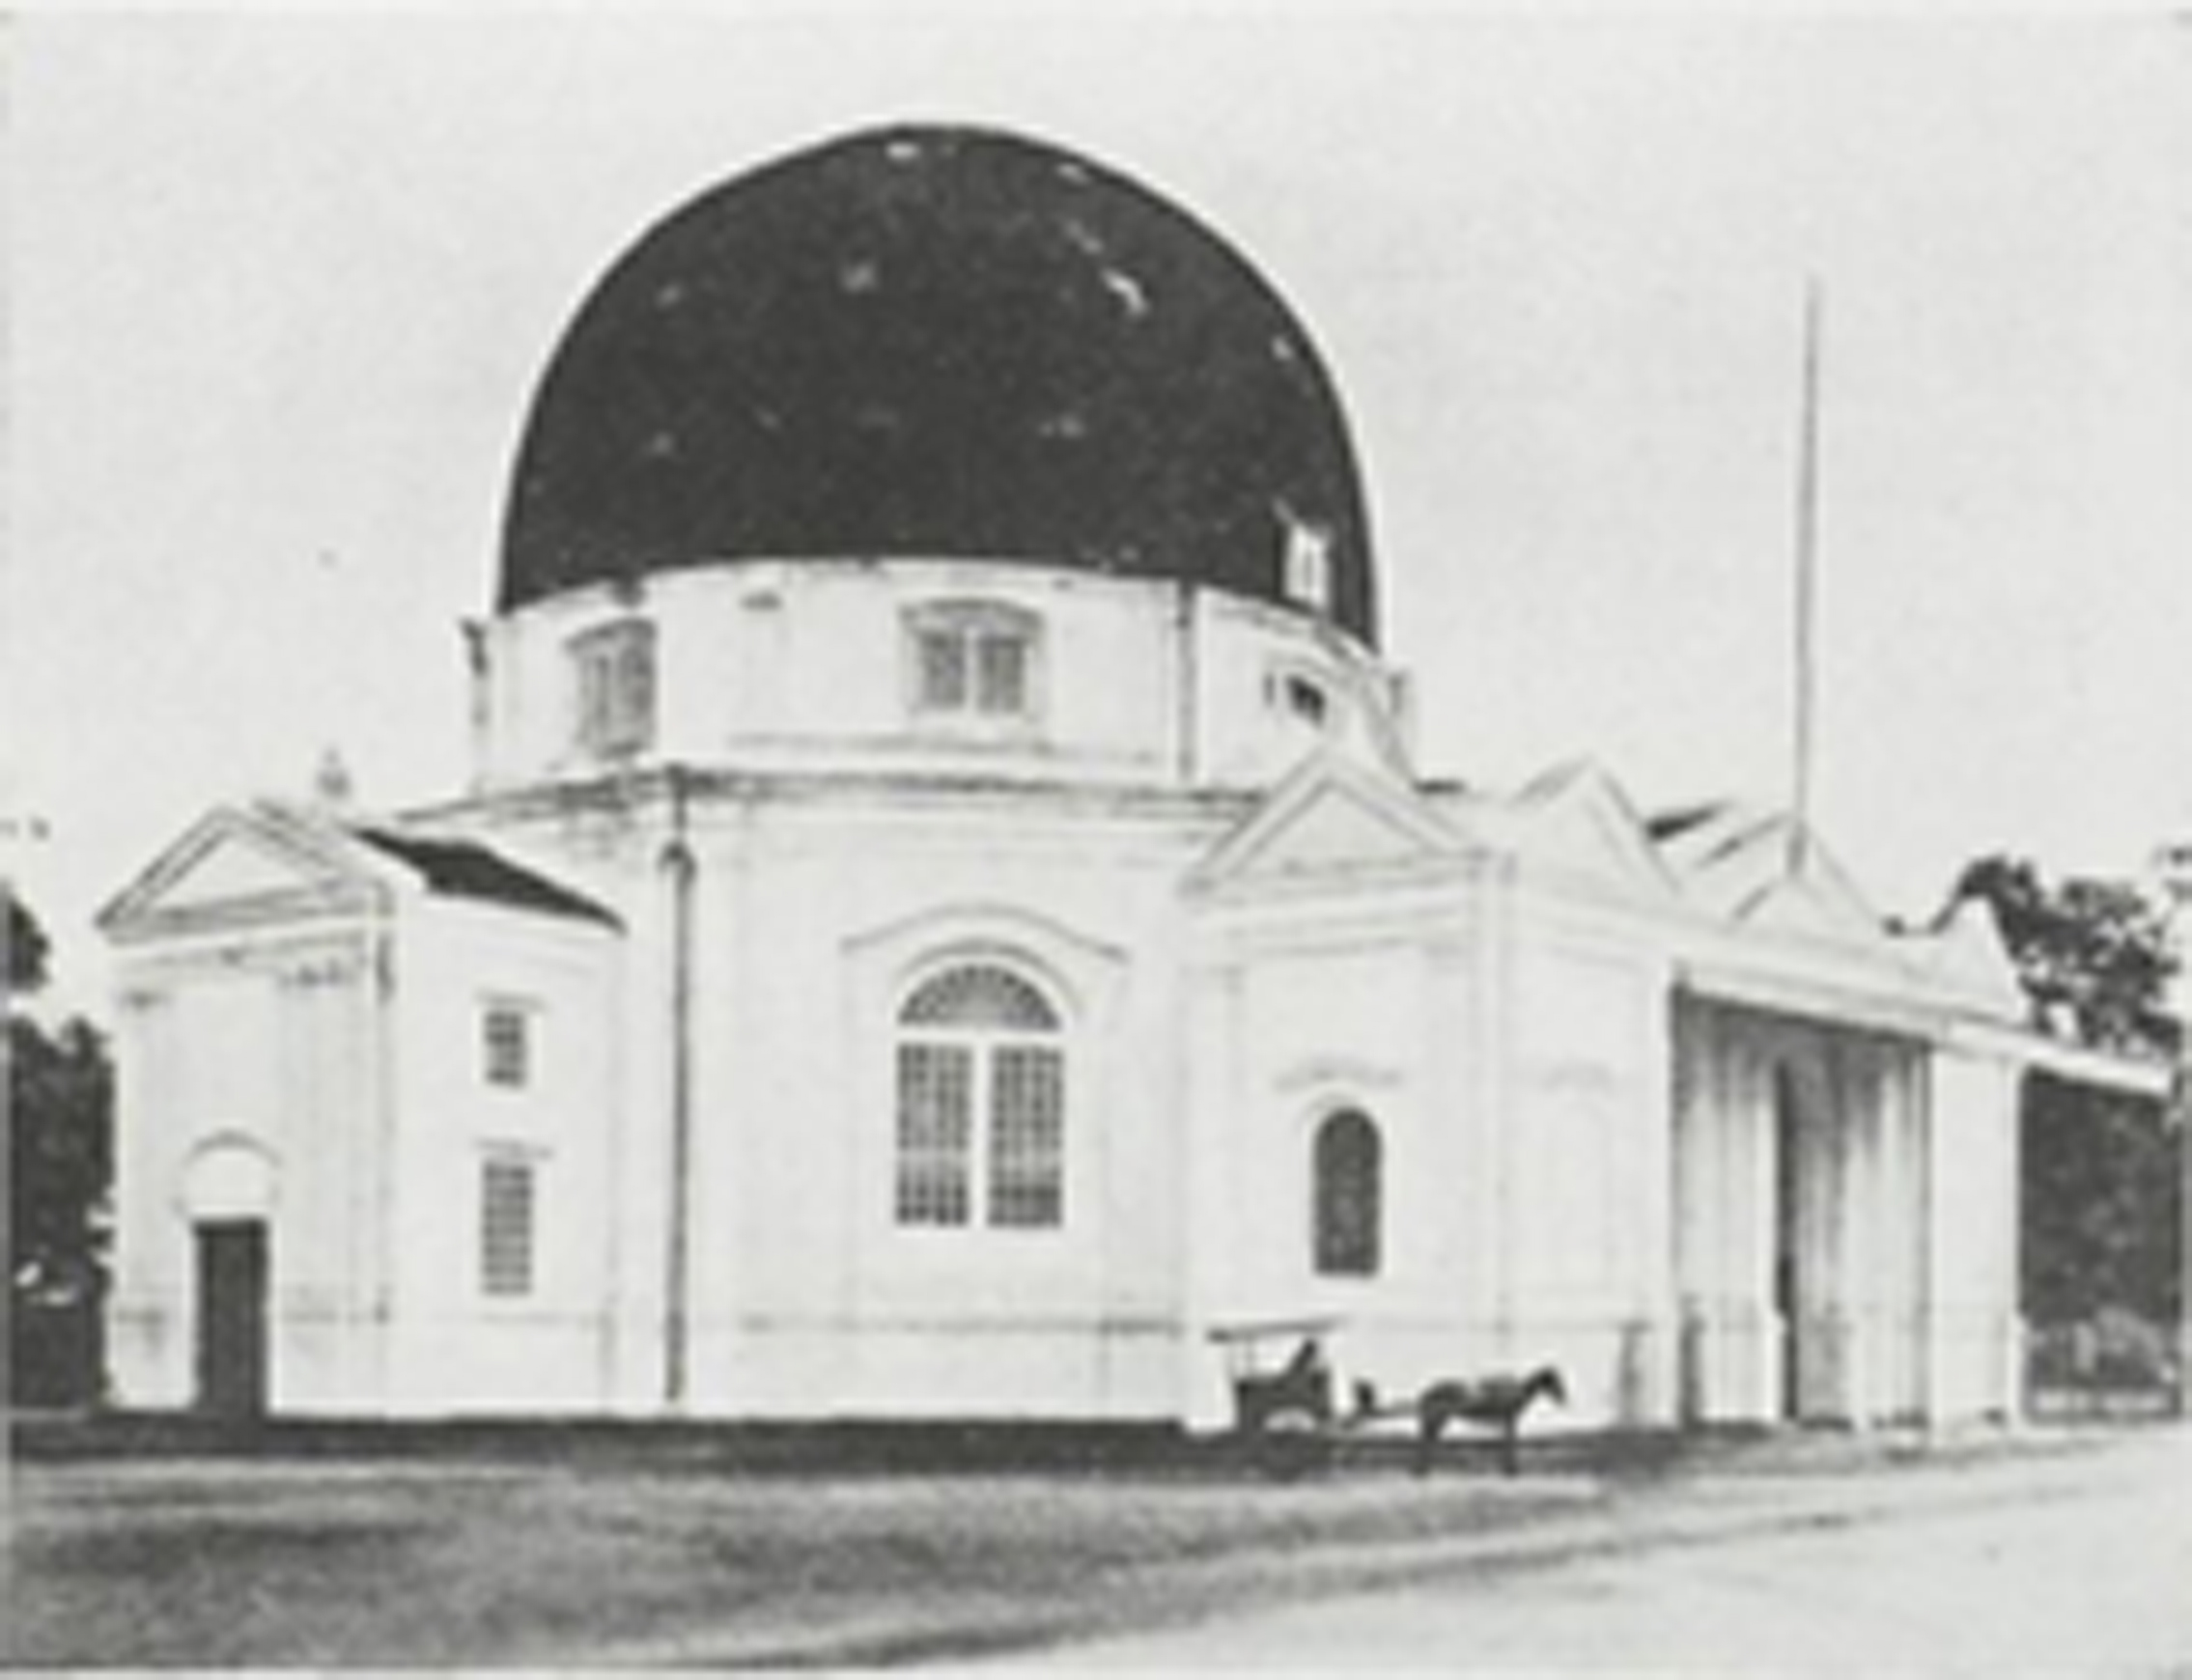 Gereja Blenduk zaman dulu   Foto: Kemendikbud.go.id